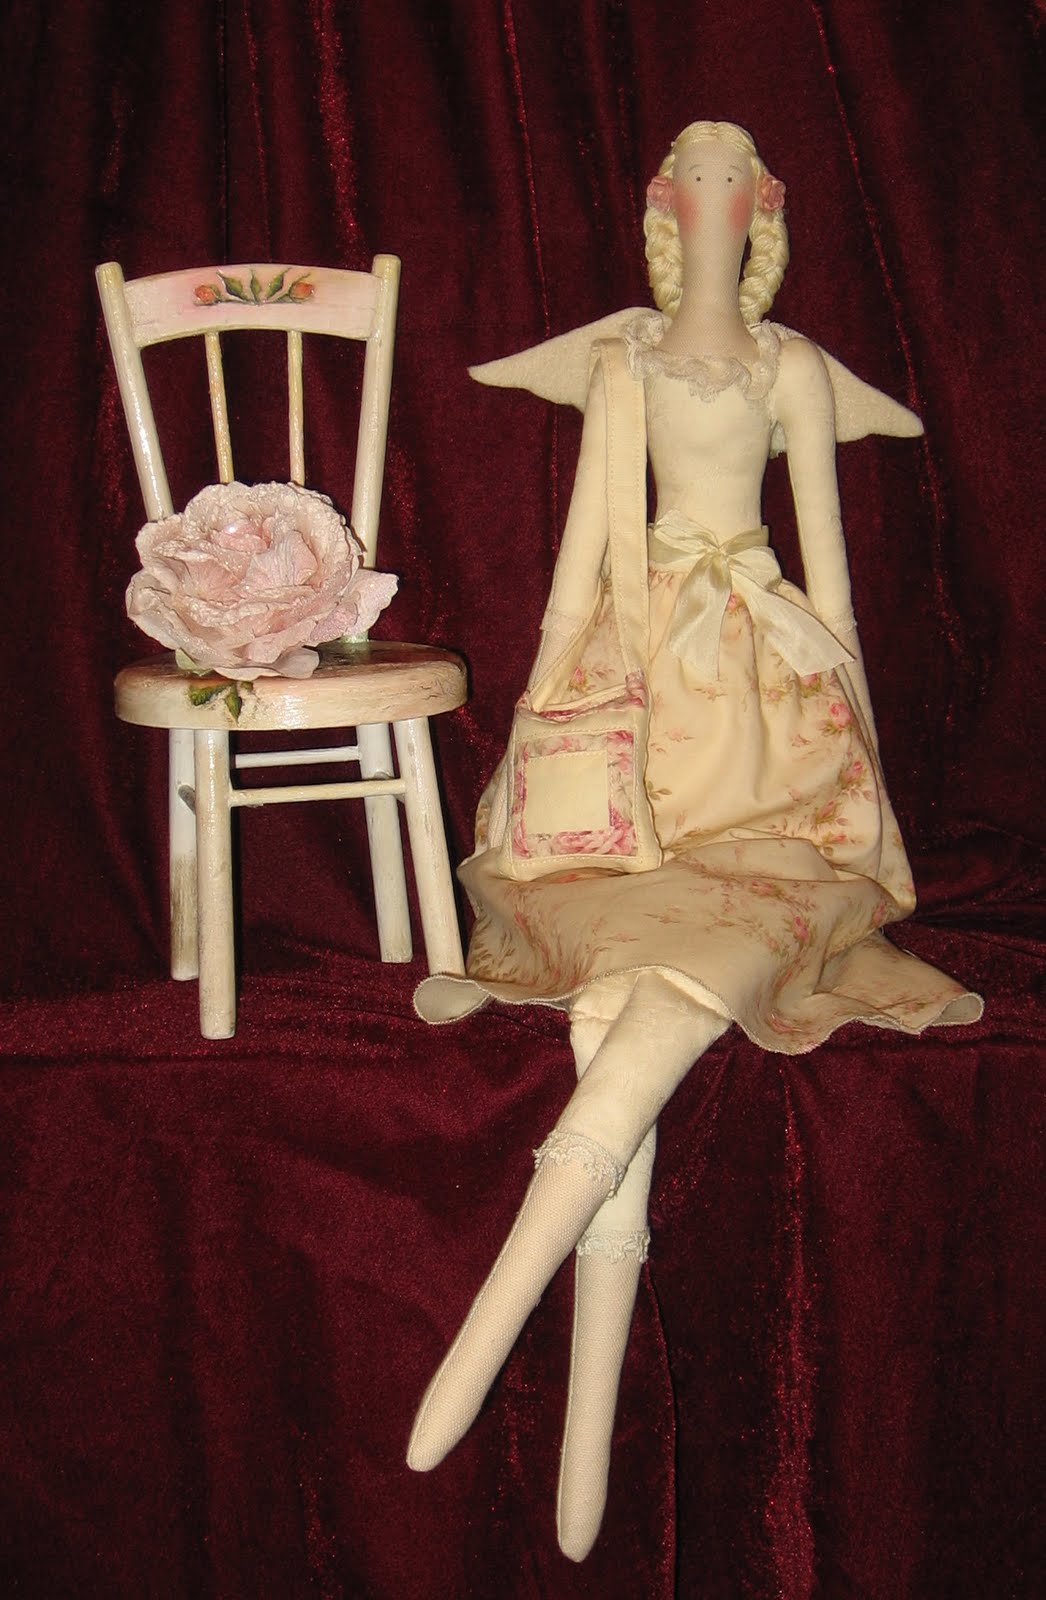 Текстильные куклы - мастер-класс: как 47